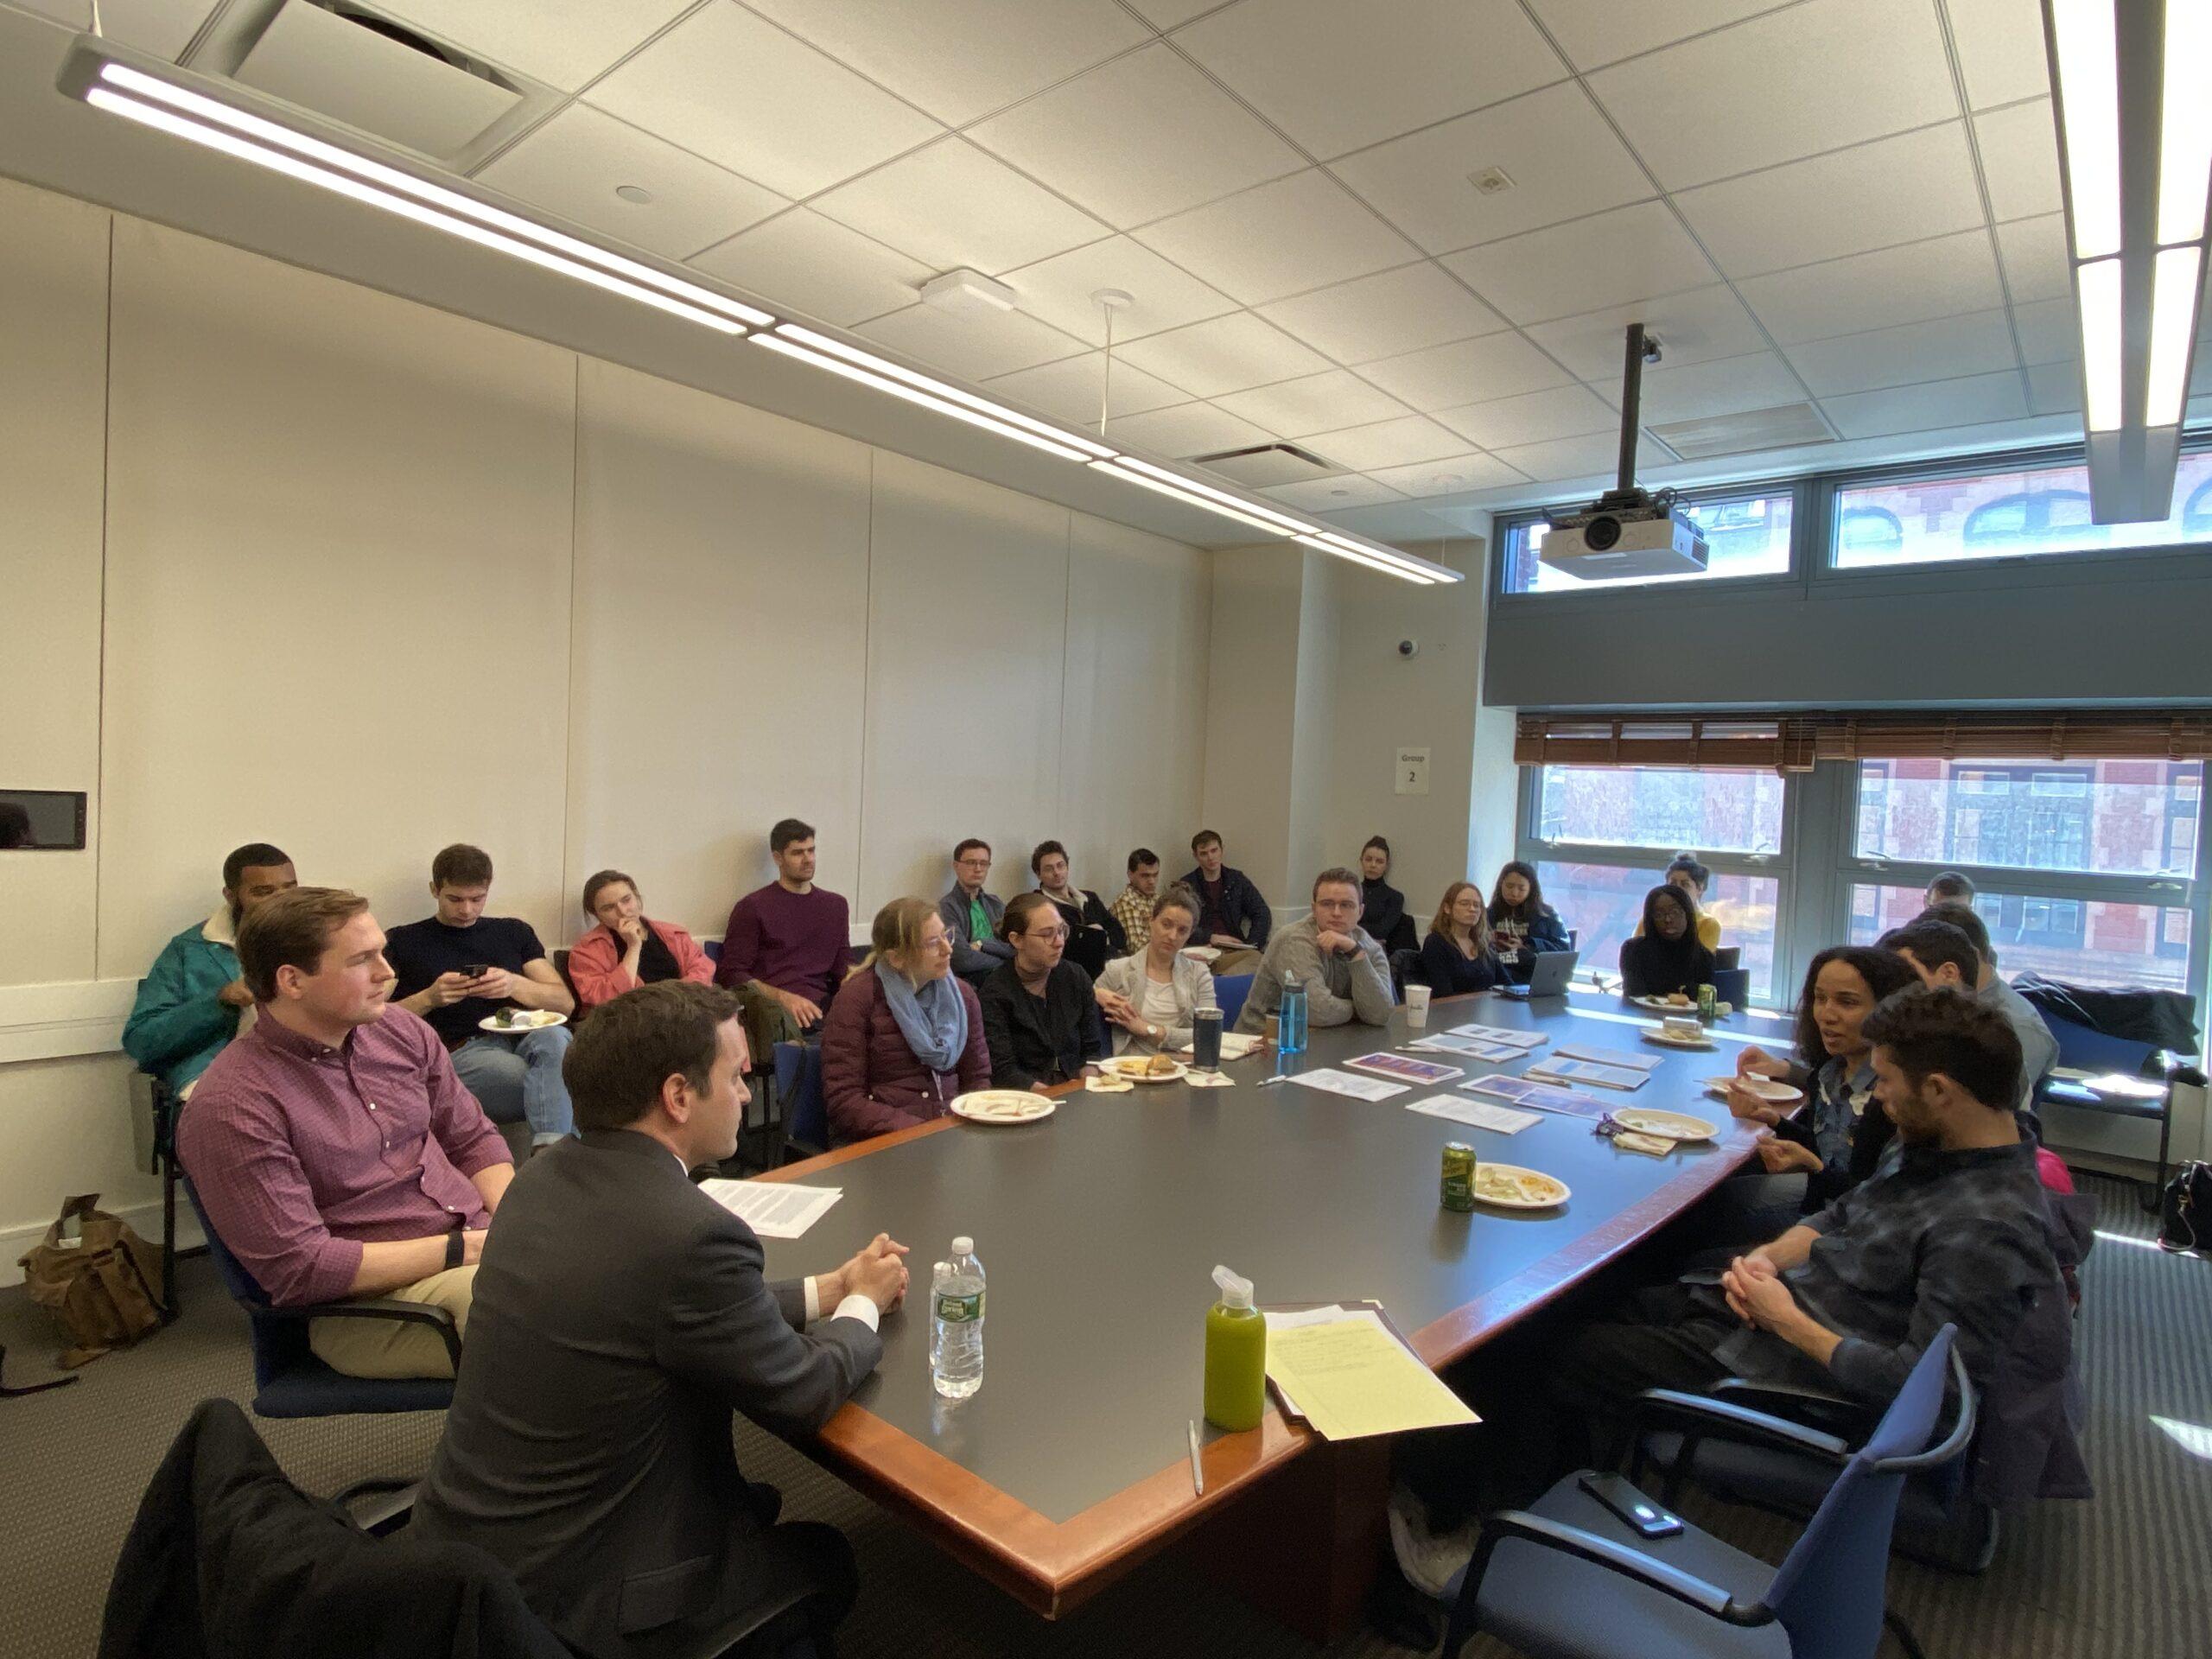 Vance Serchuk speaks with students